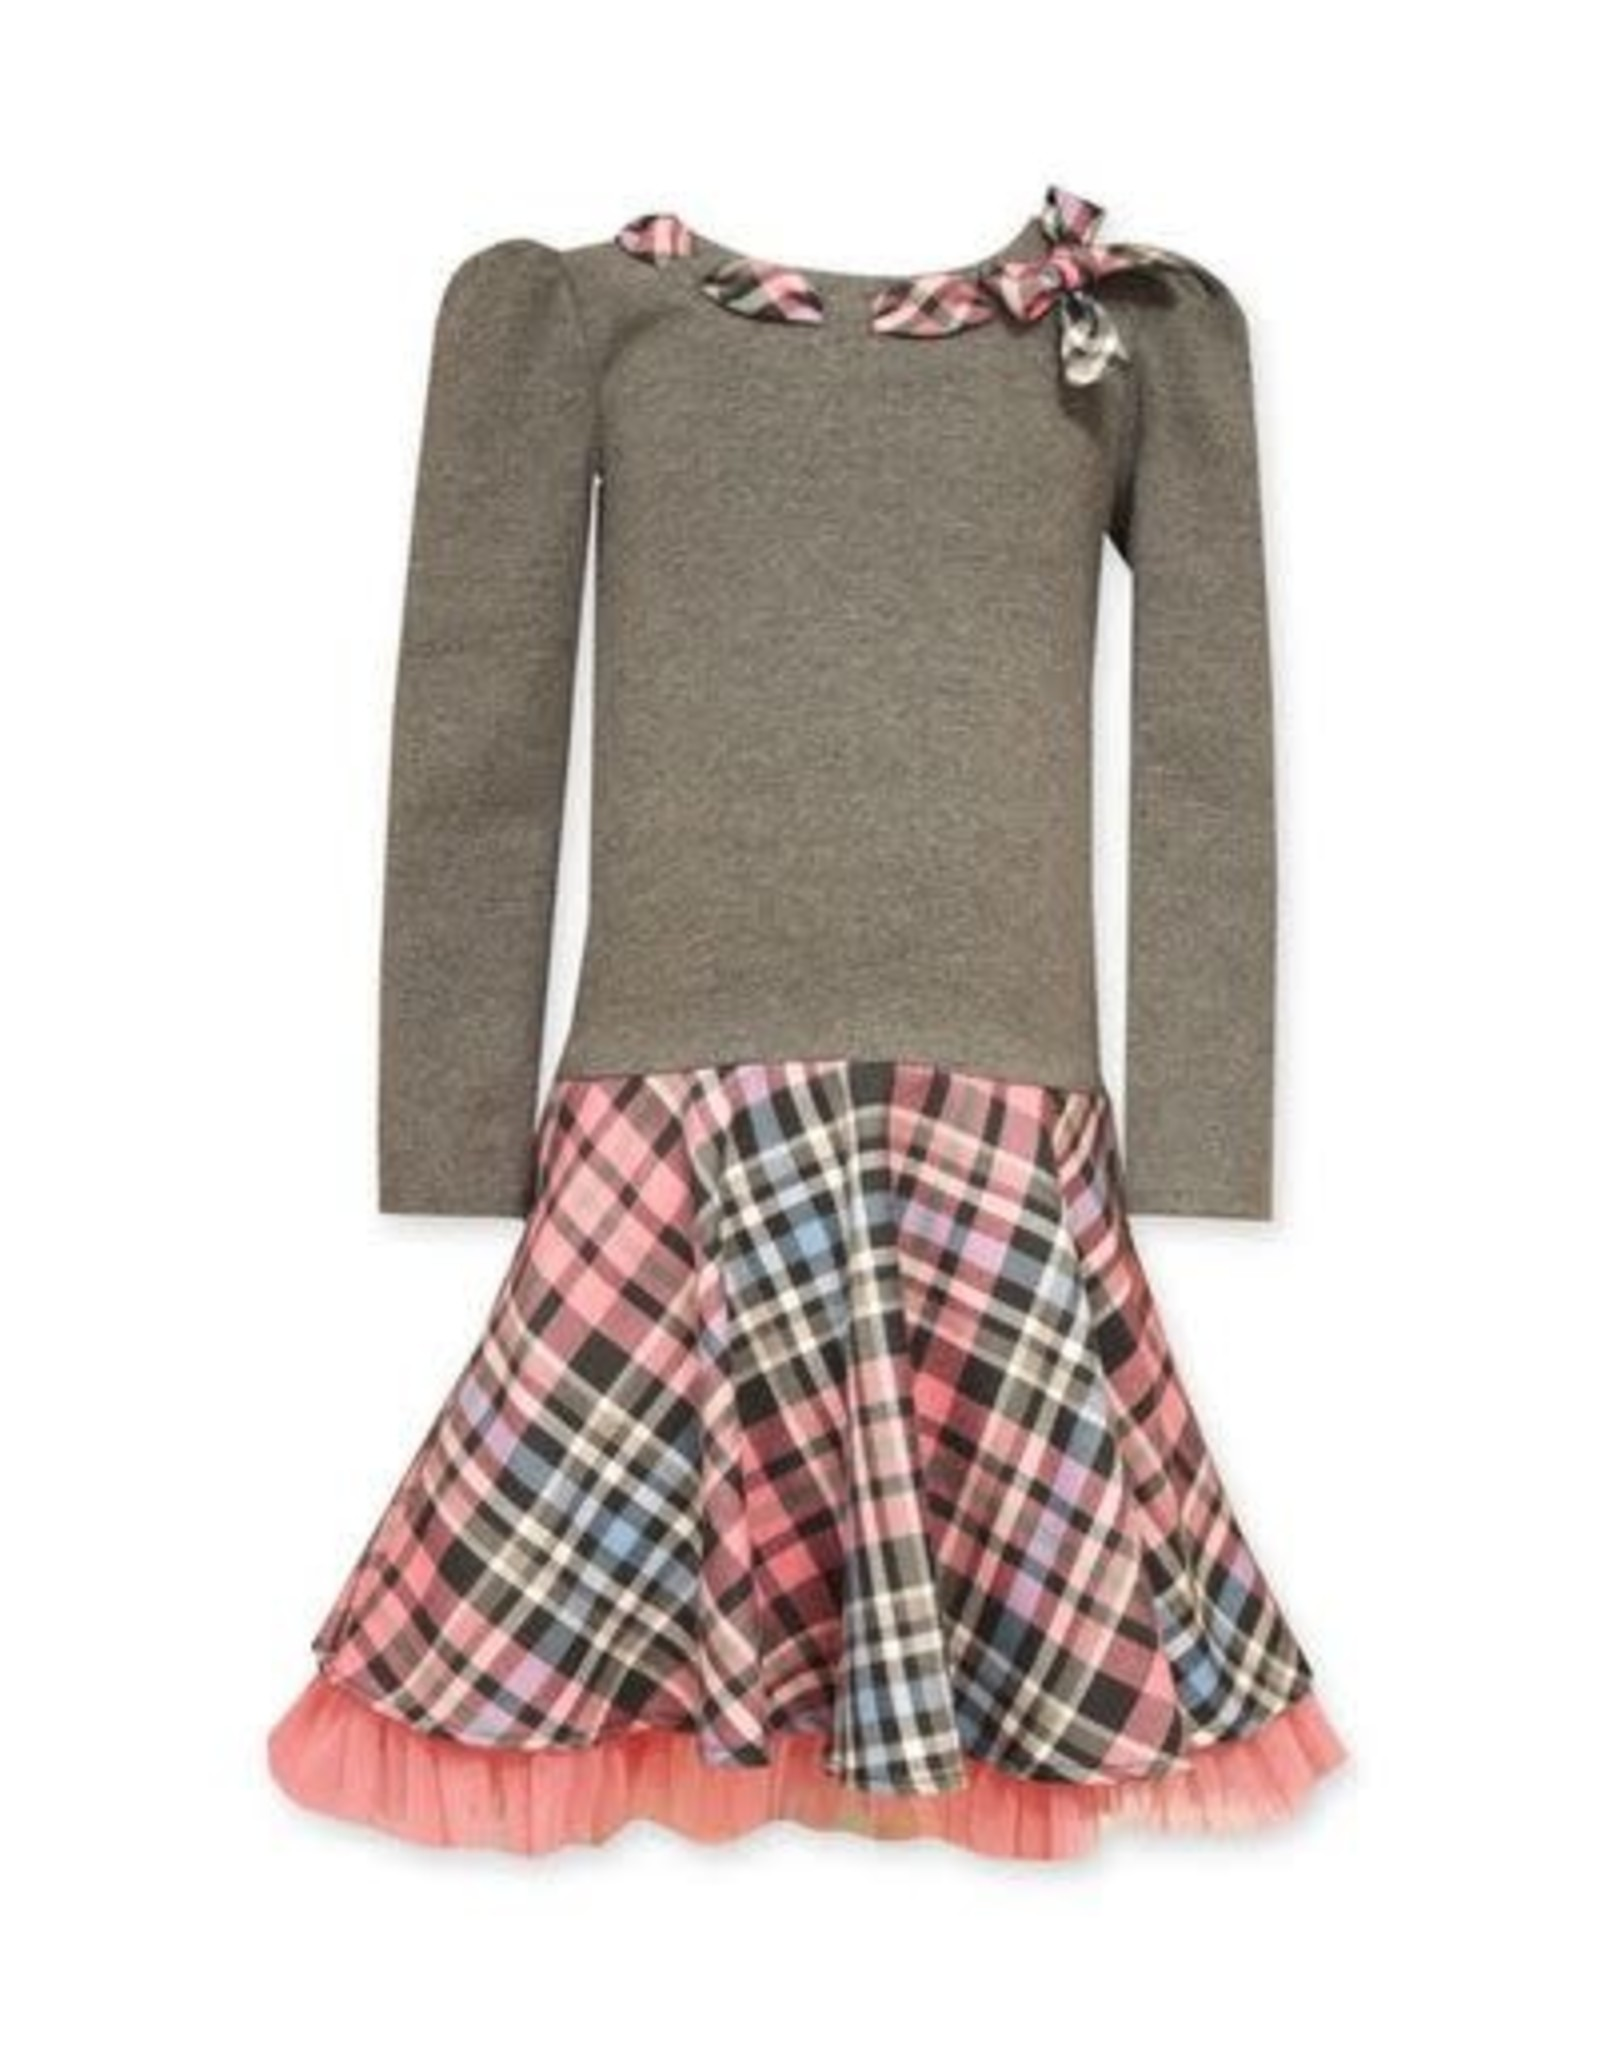 Bonnie Jean Grey Dress with Pink Plaid